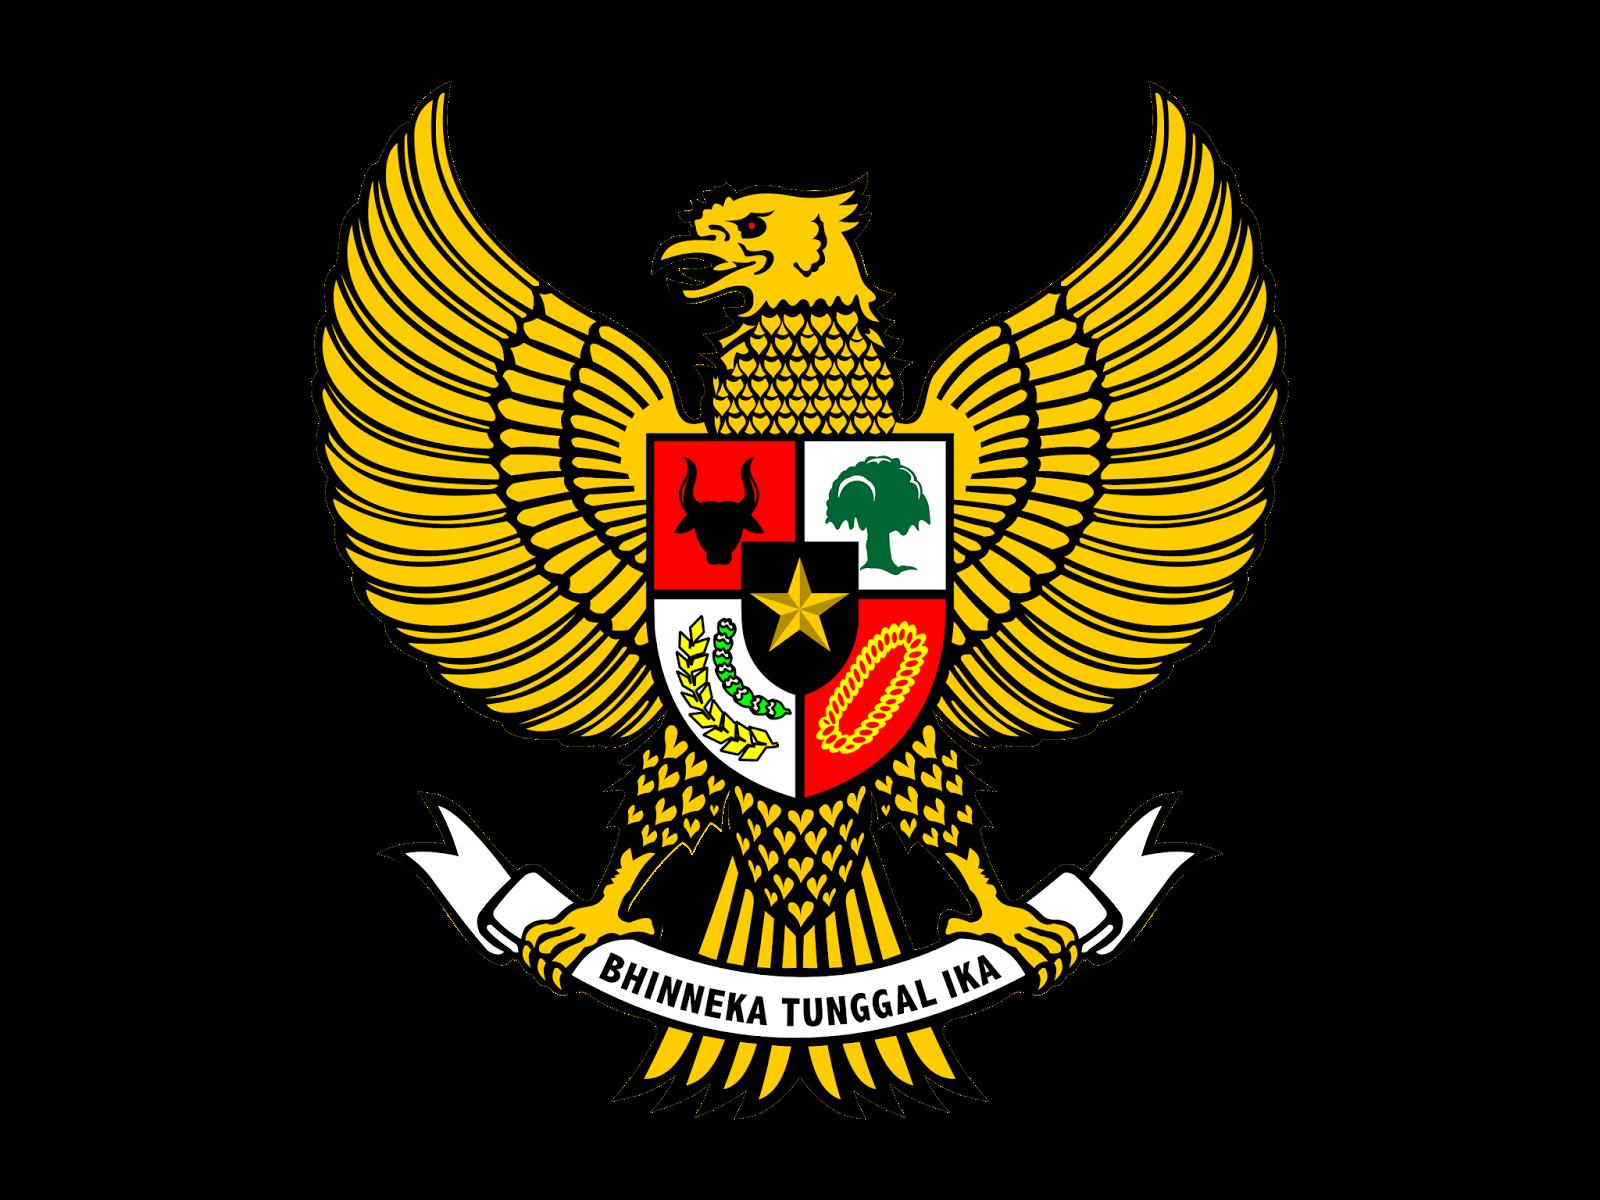 Garuda Png Free Images Download Transparent Garuda Indonesia Pictures Free Transparent Png Logos